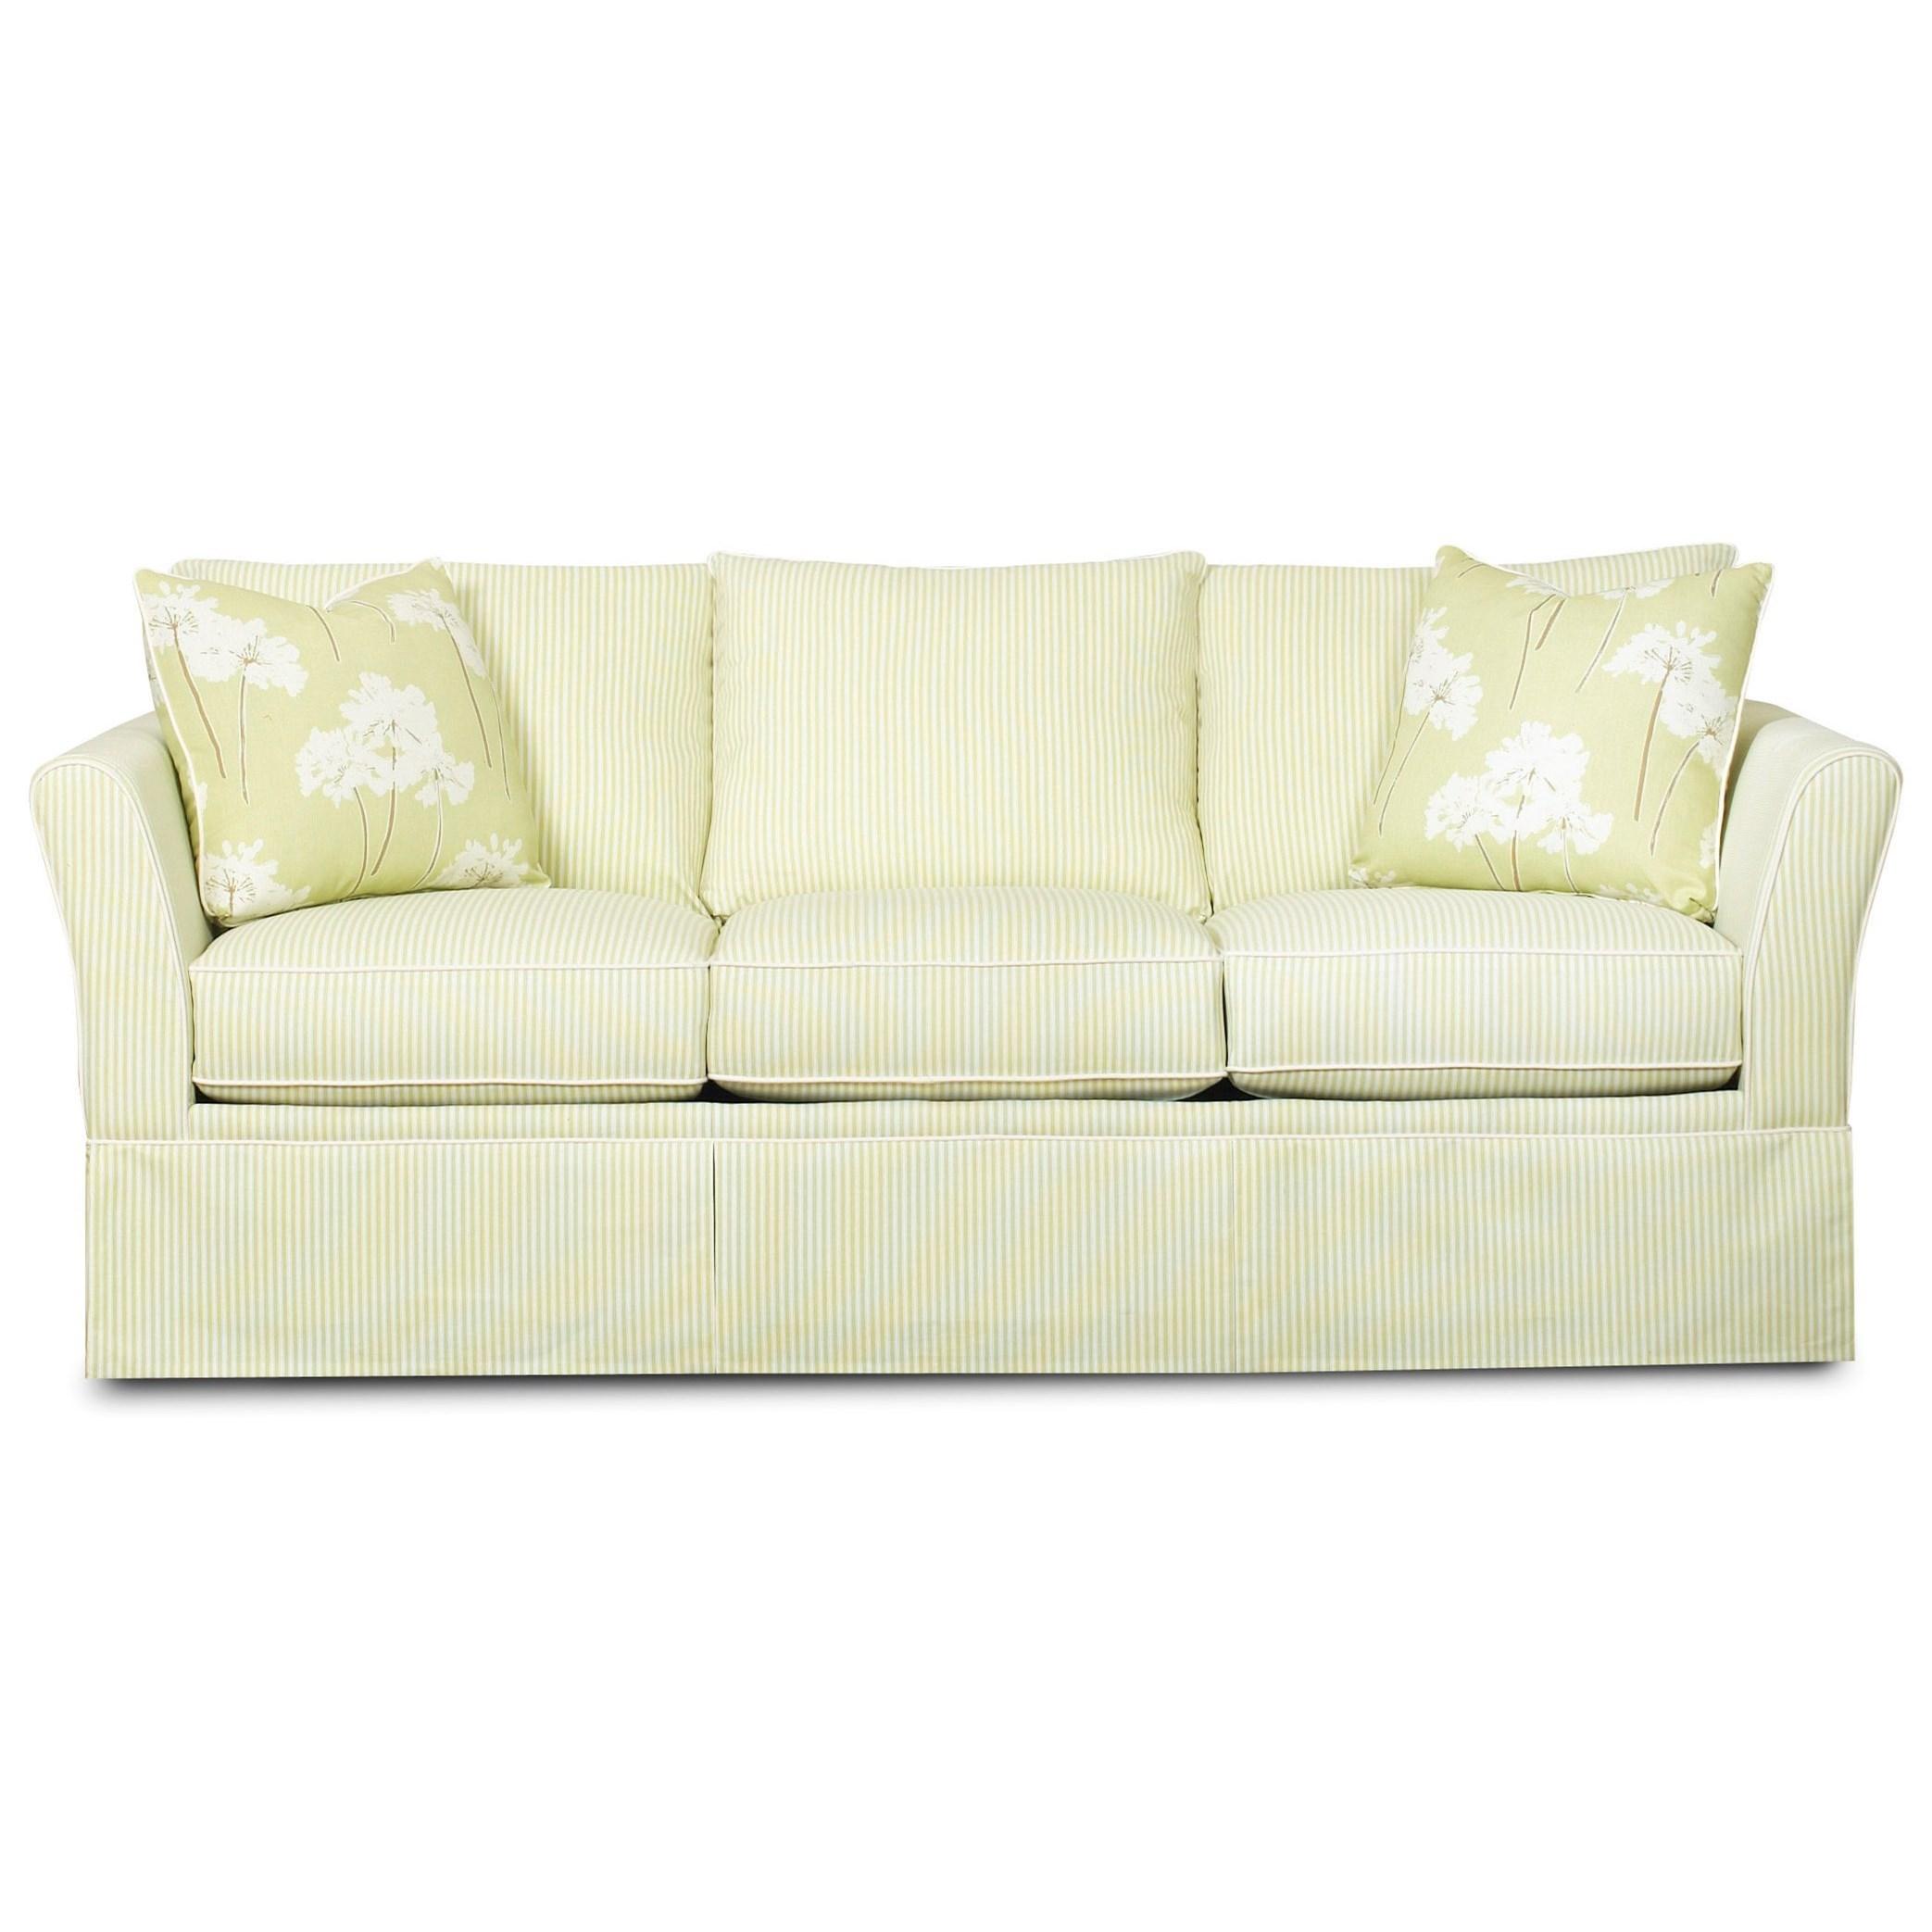 Queen Dream Quest Sleeper Sofa